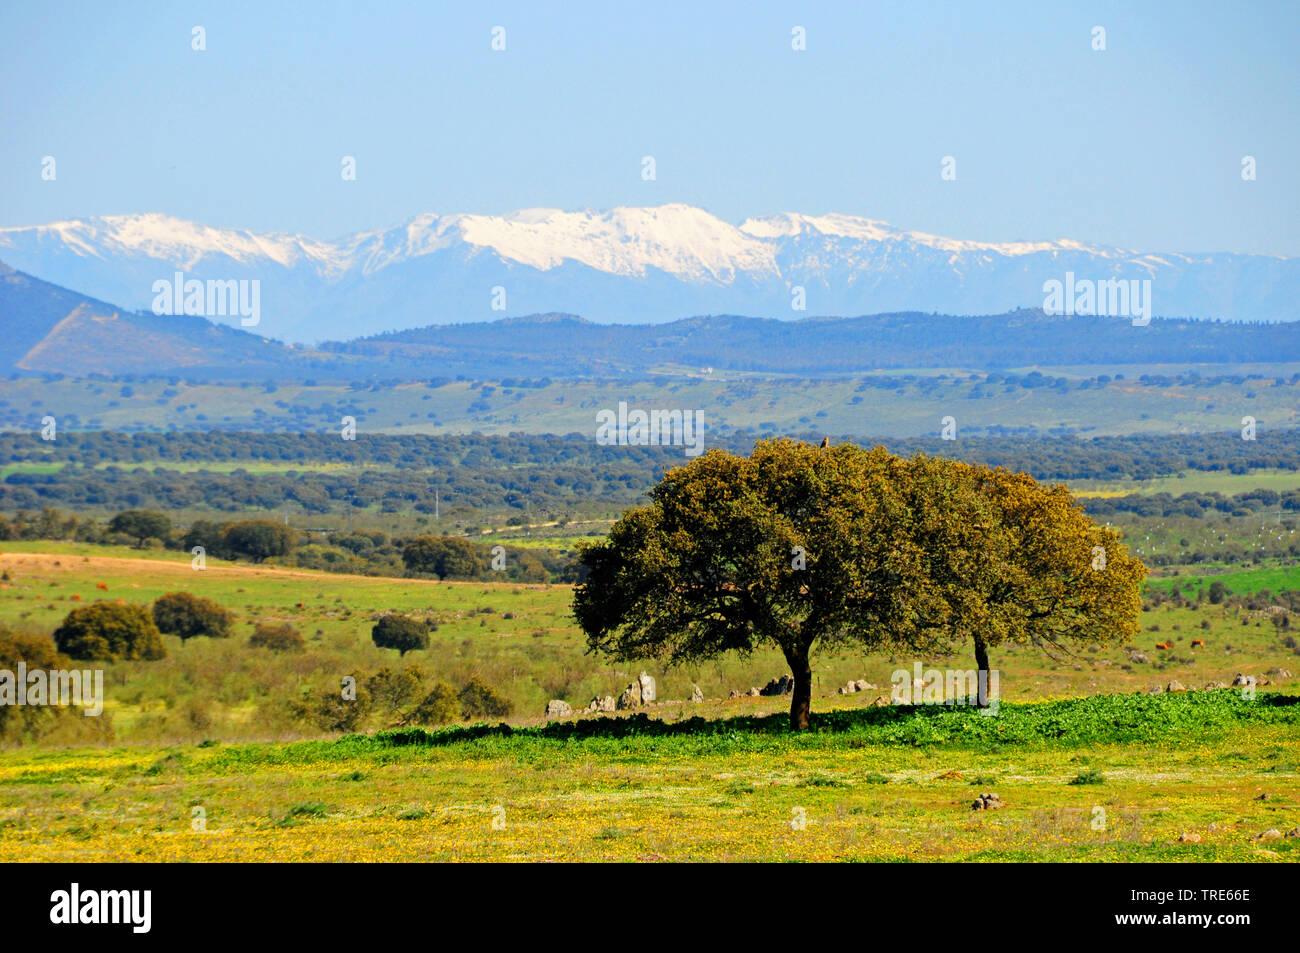 Johannisbrotbaum, Johannisbrot-Baum, Karobe (Ceratonia siliqua), Landschaft Extramadura, Spanien, Extremadura   carob, carob bean, St. John's bread (C - Stock Image